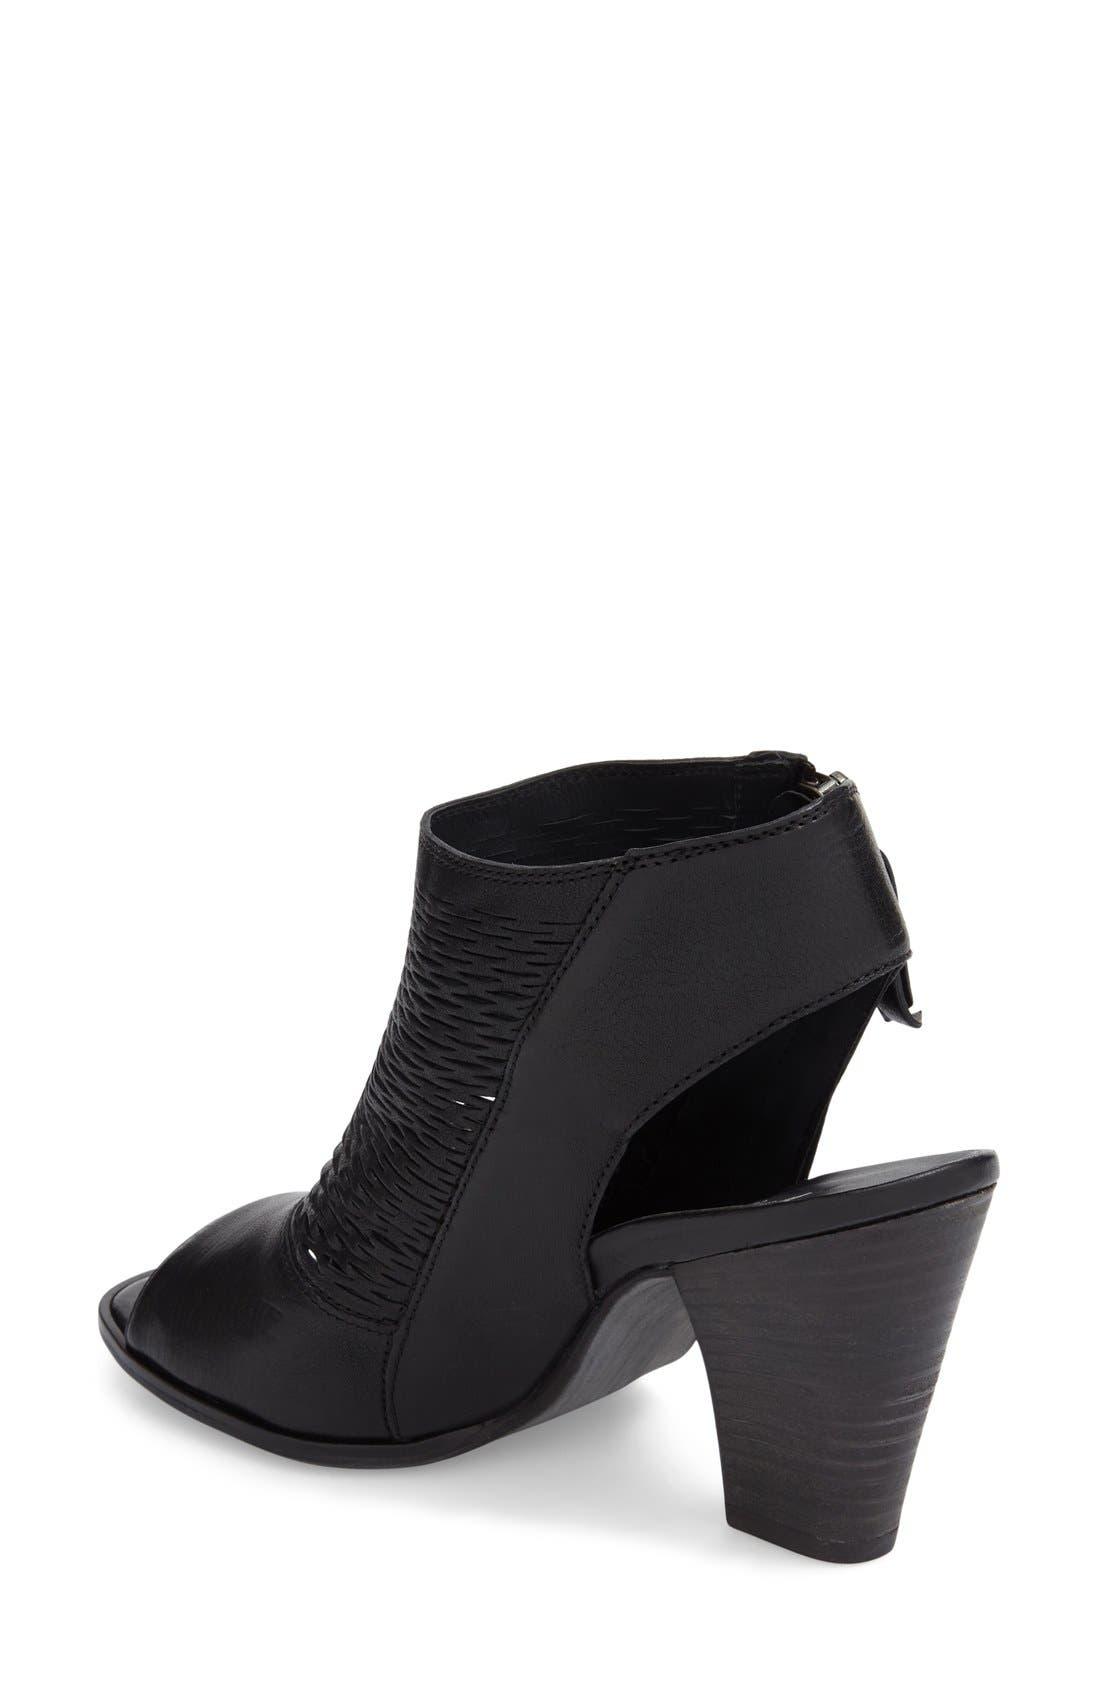 'Willow' Peep Toe Sandal,                             Alternate thumbnail 3, color,                             Black Leather